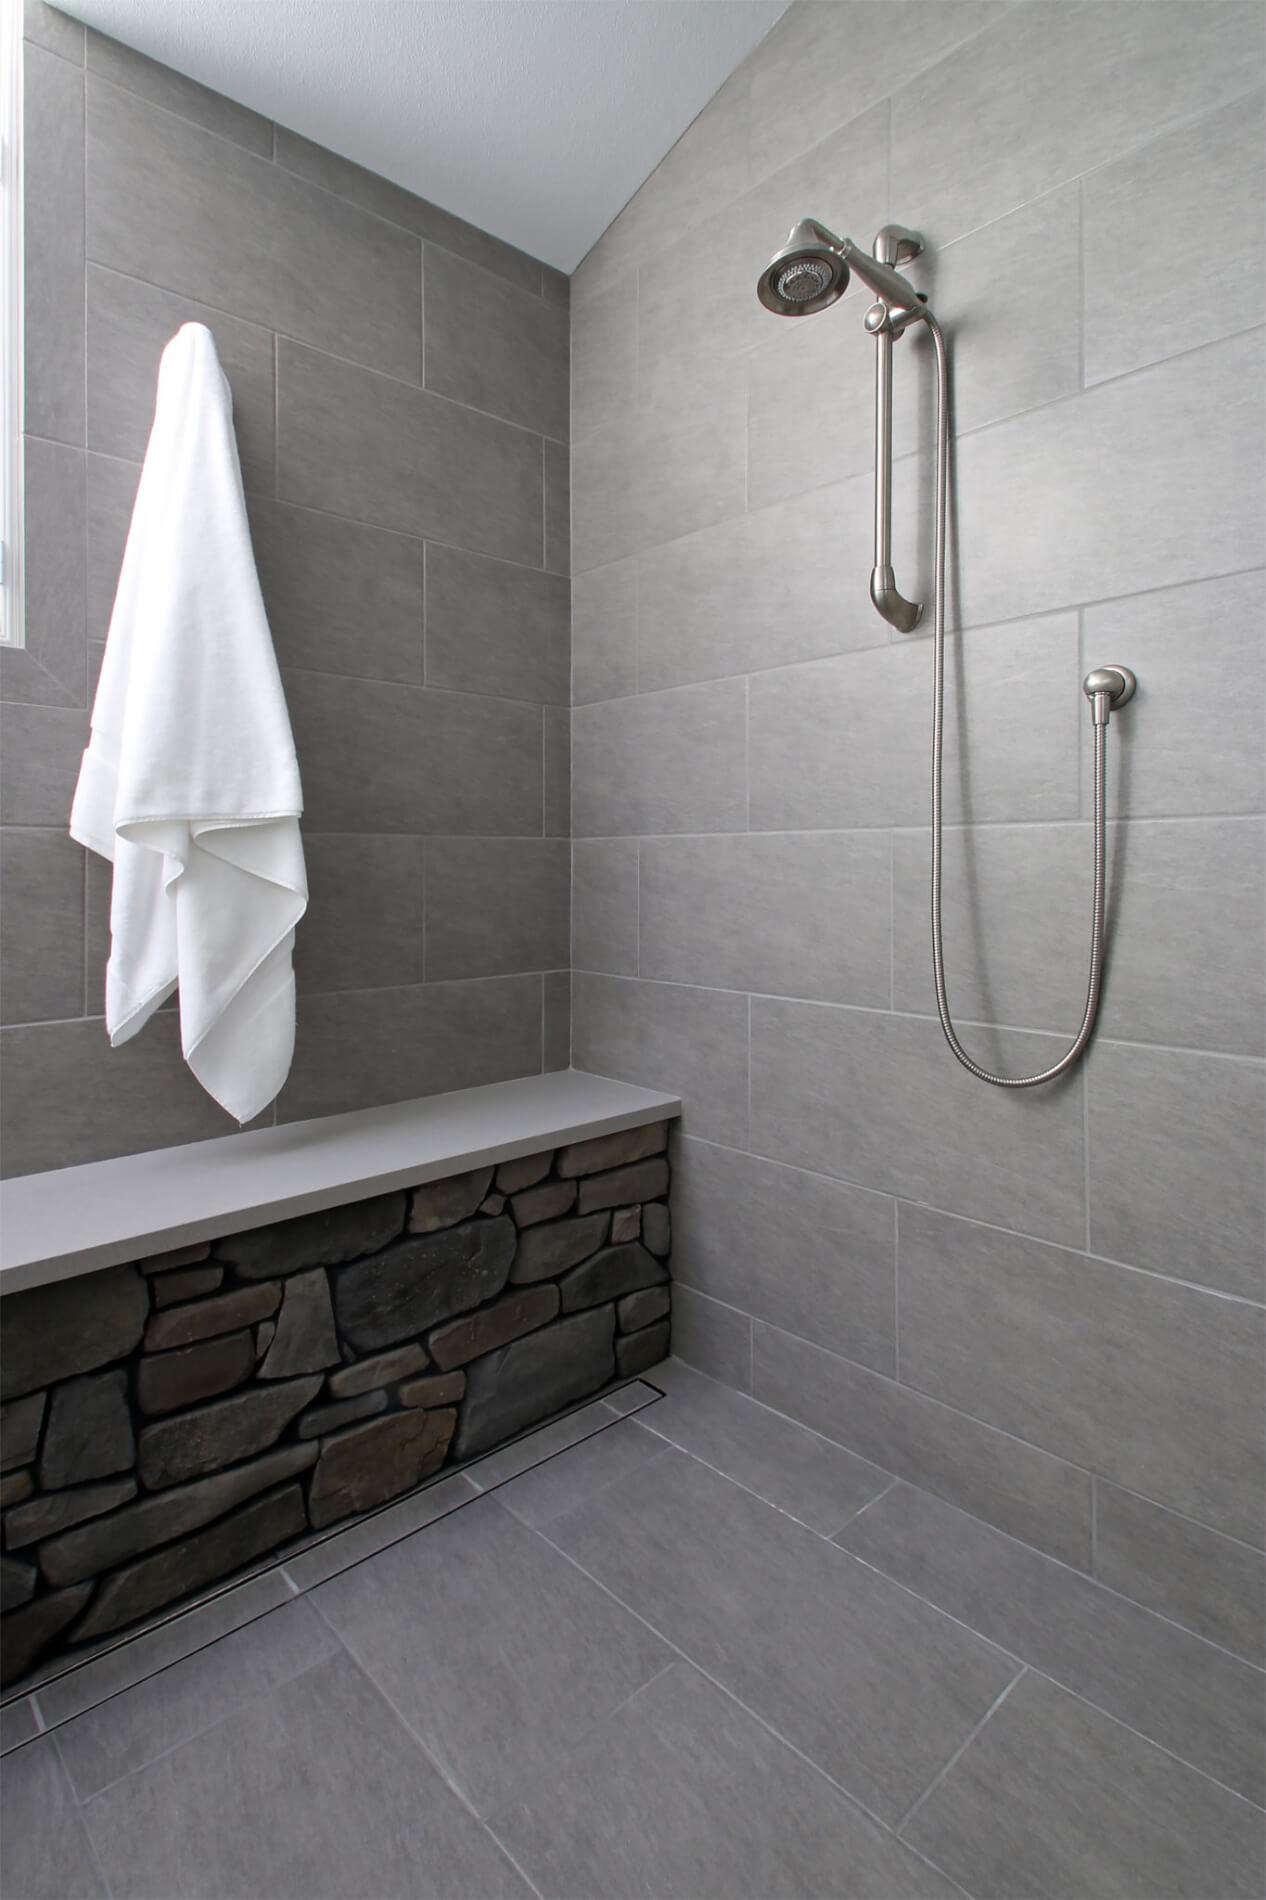 Seamless Shower Drain, Beautiful Newport Beach Master Bathroom Remodel, Master Bathroom Remodel